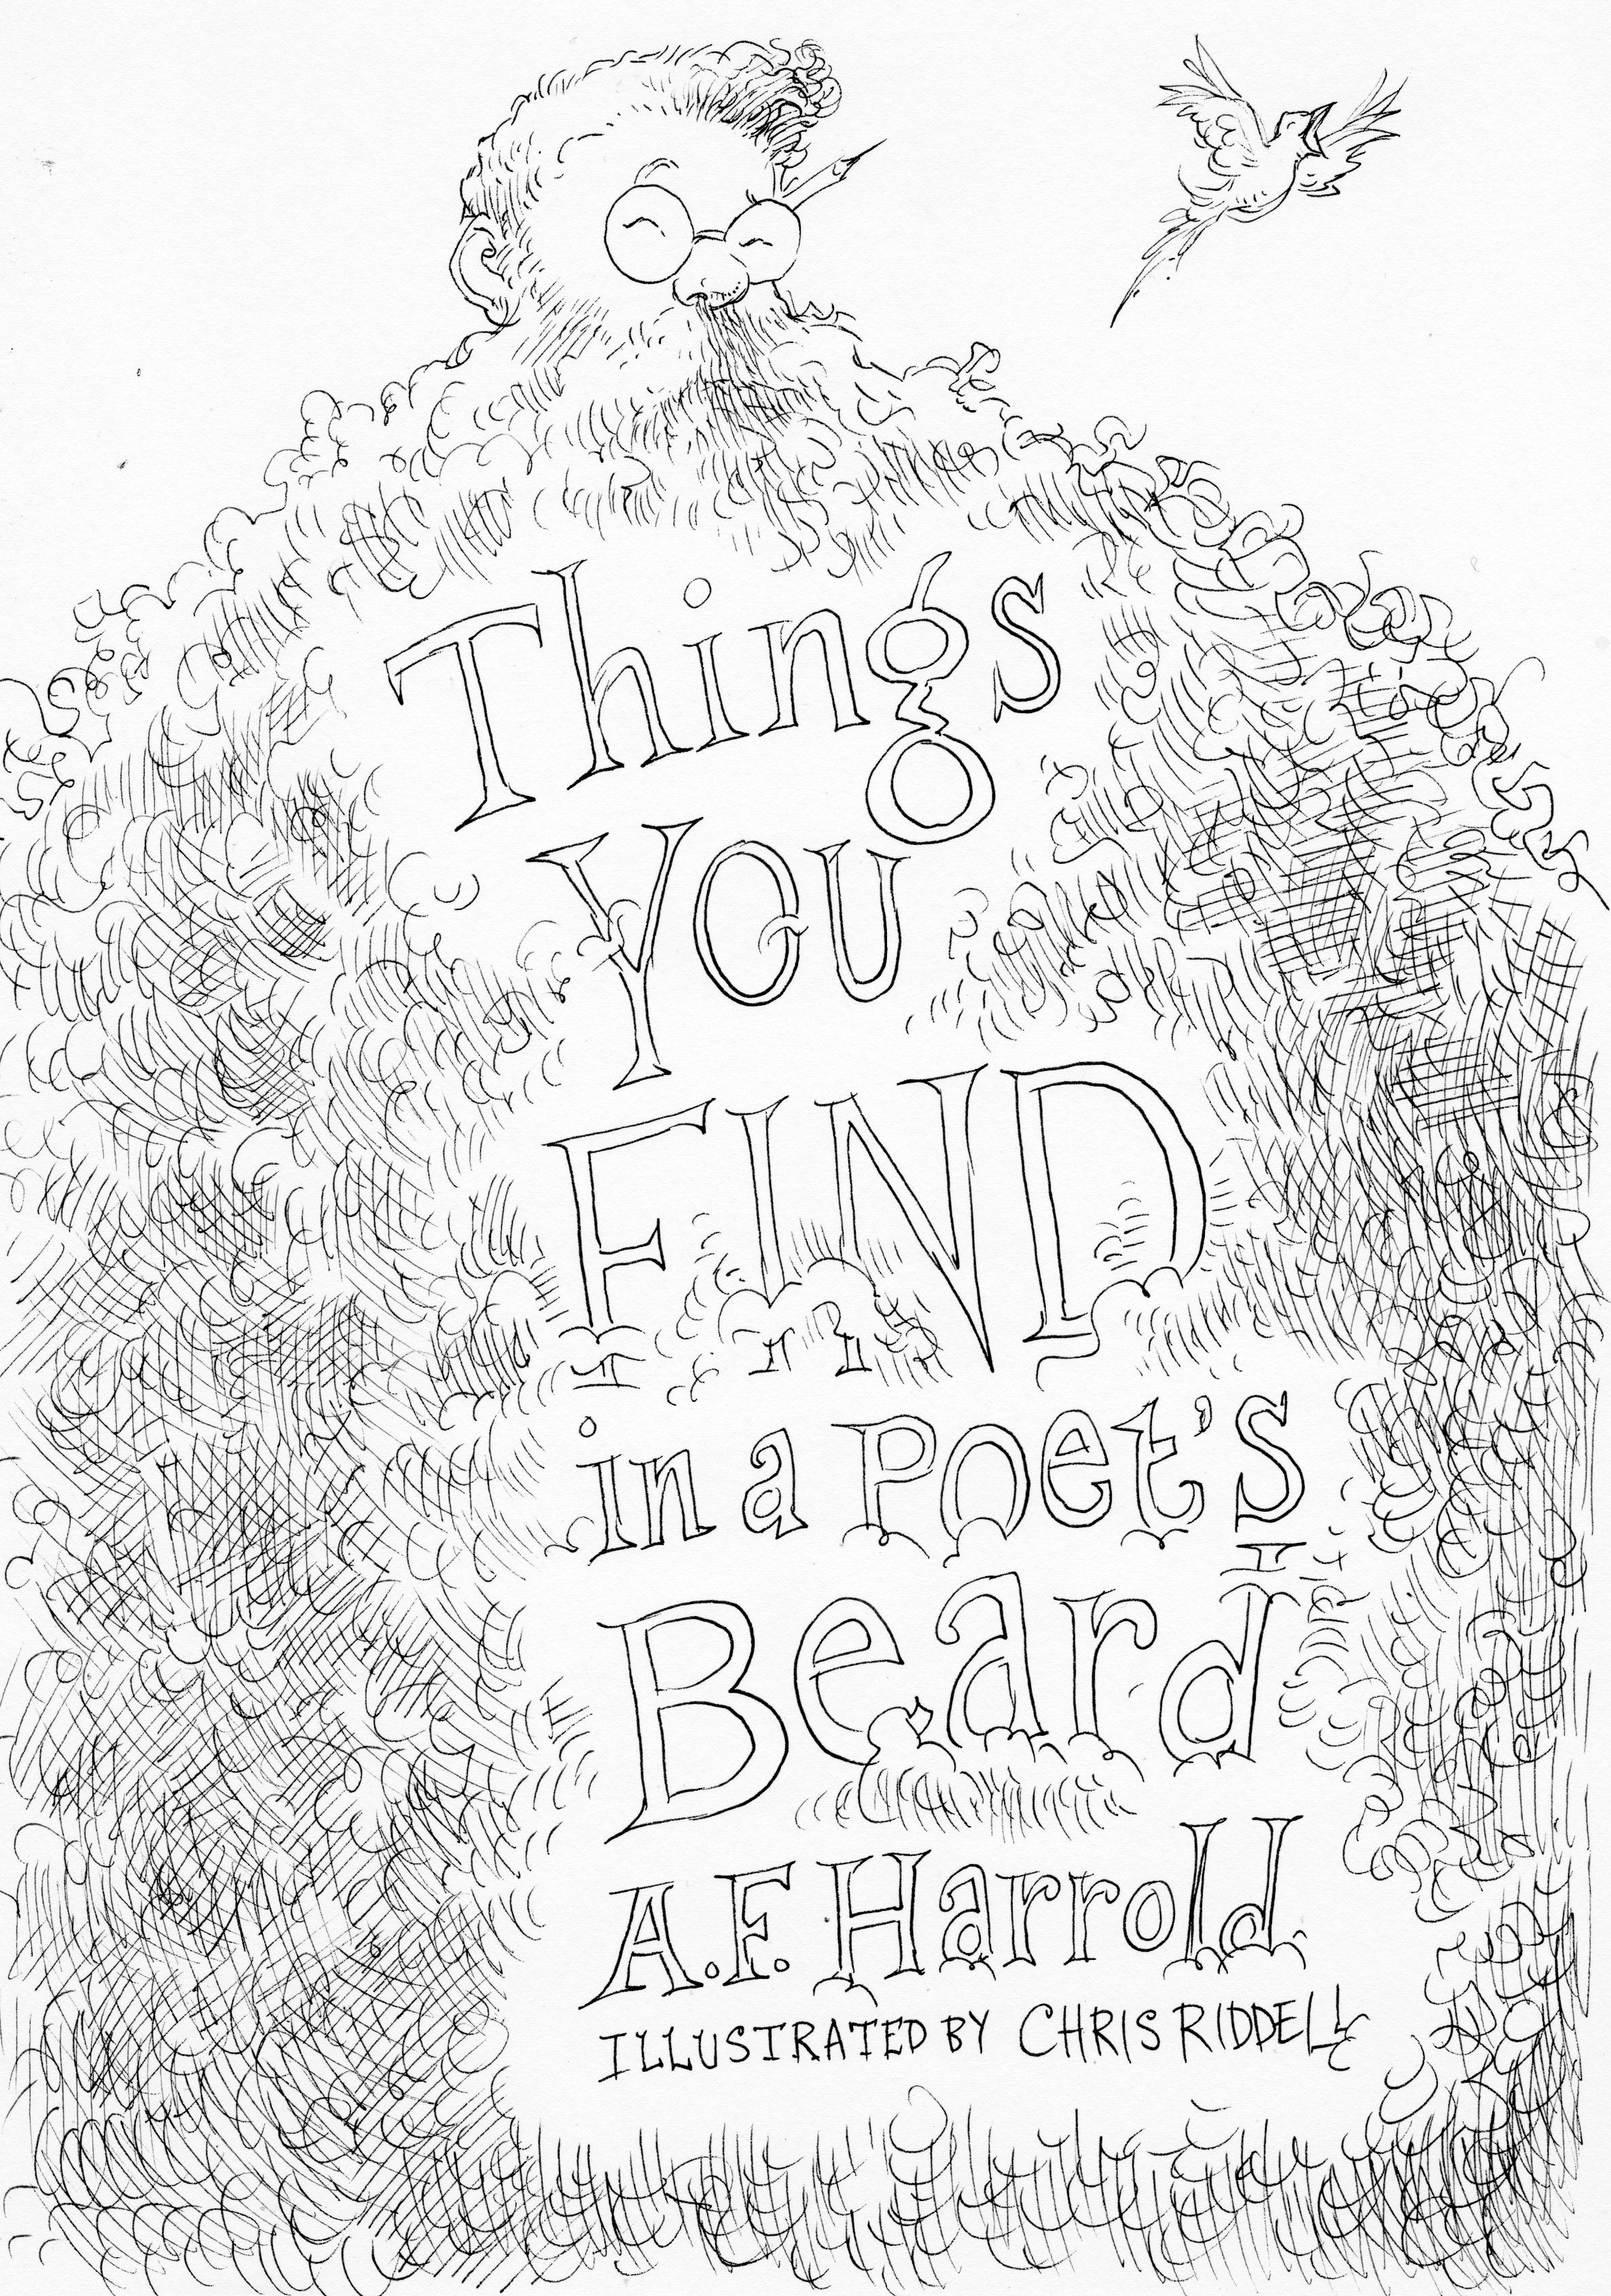 Poet's Beard cover.jpeg